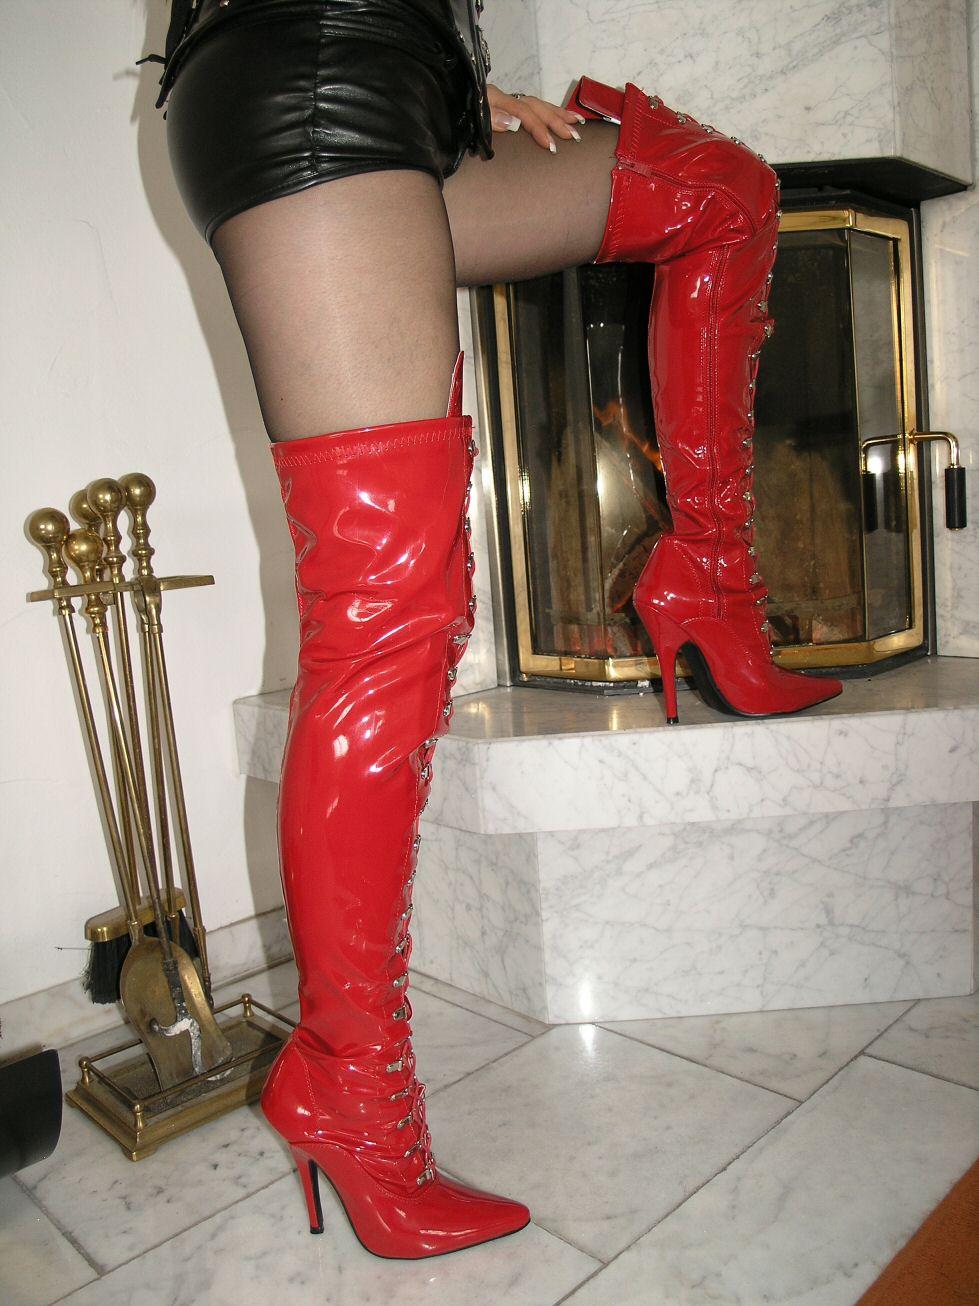 Cheap Stiletto High Heel Shoes